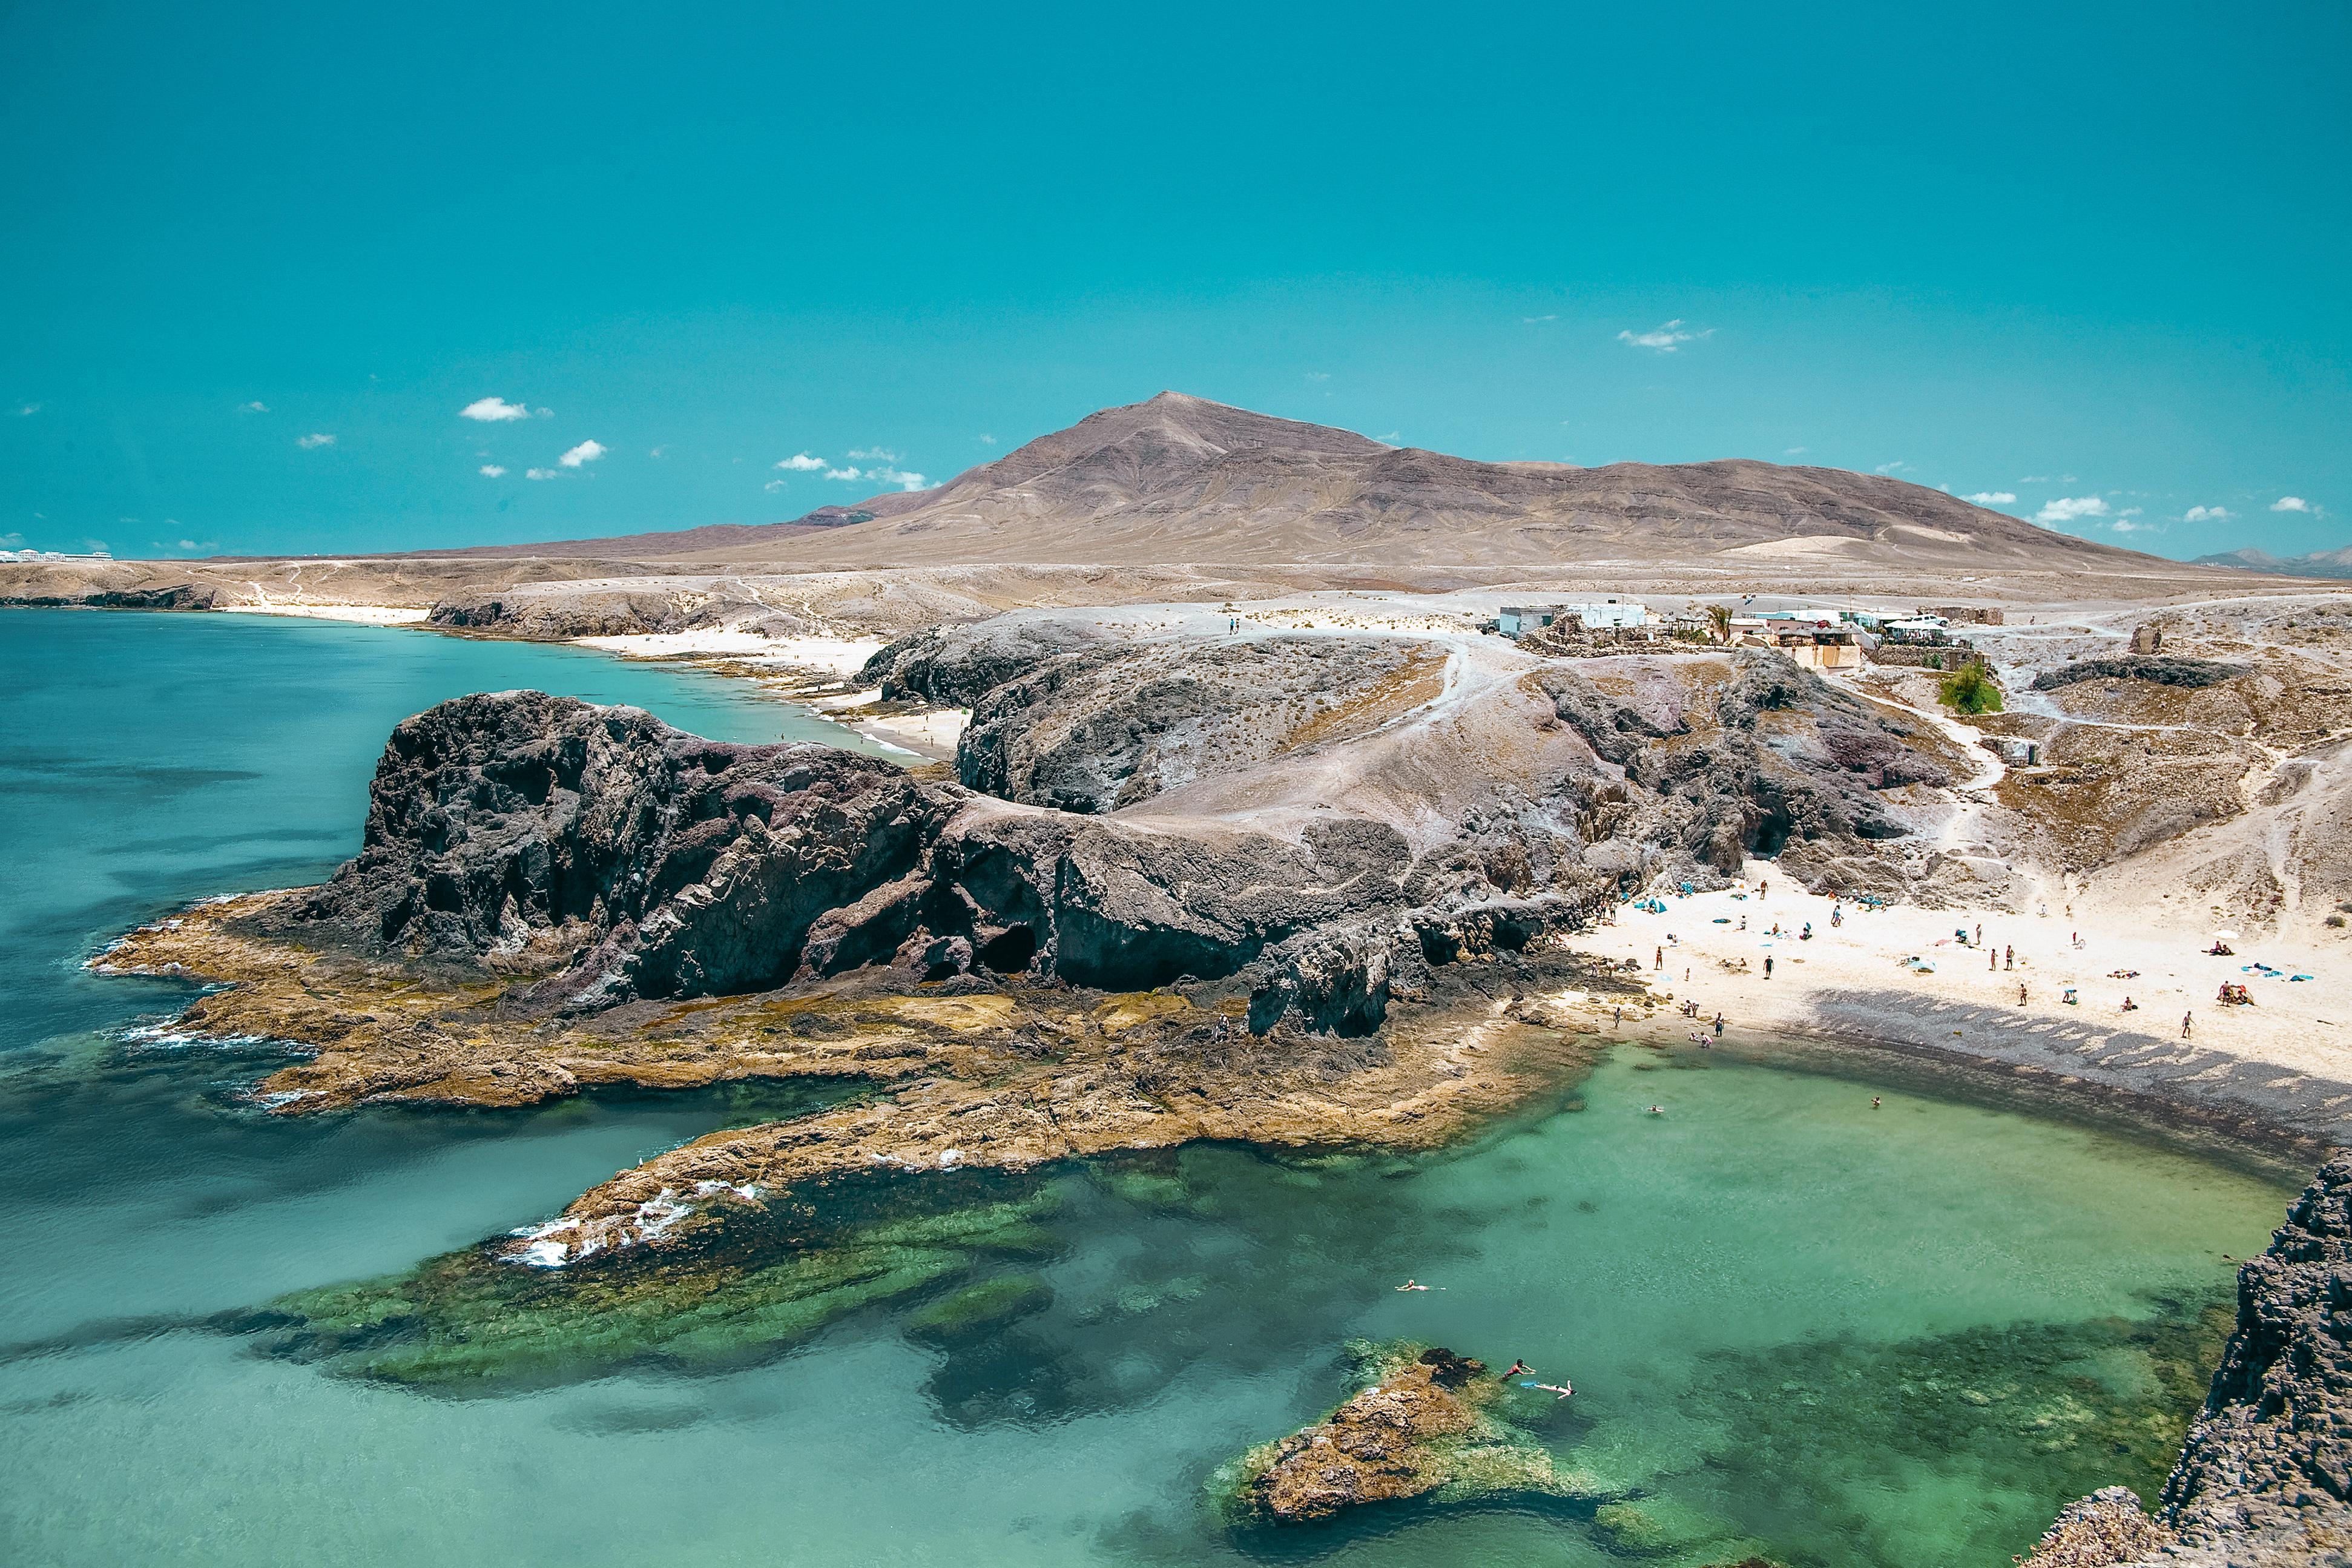 Spanien Lanzarote Karta.Lanzarote Boka Din Resa Till Lanzarote Med Ving Vi Kan Resor